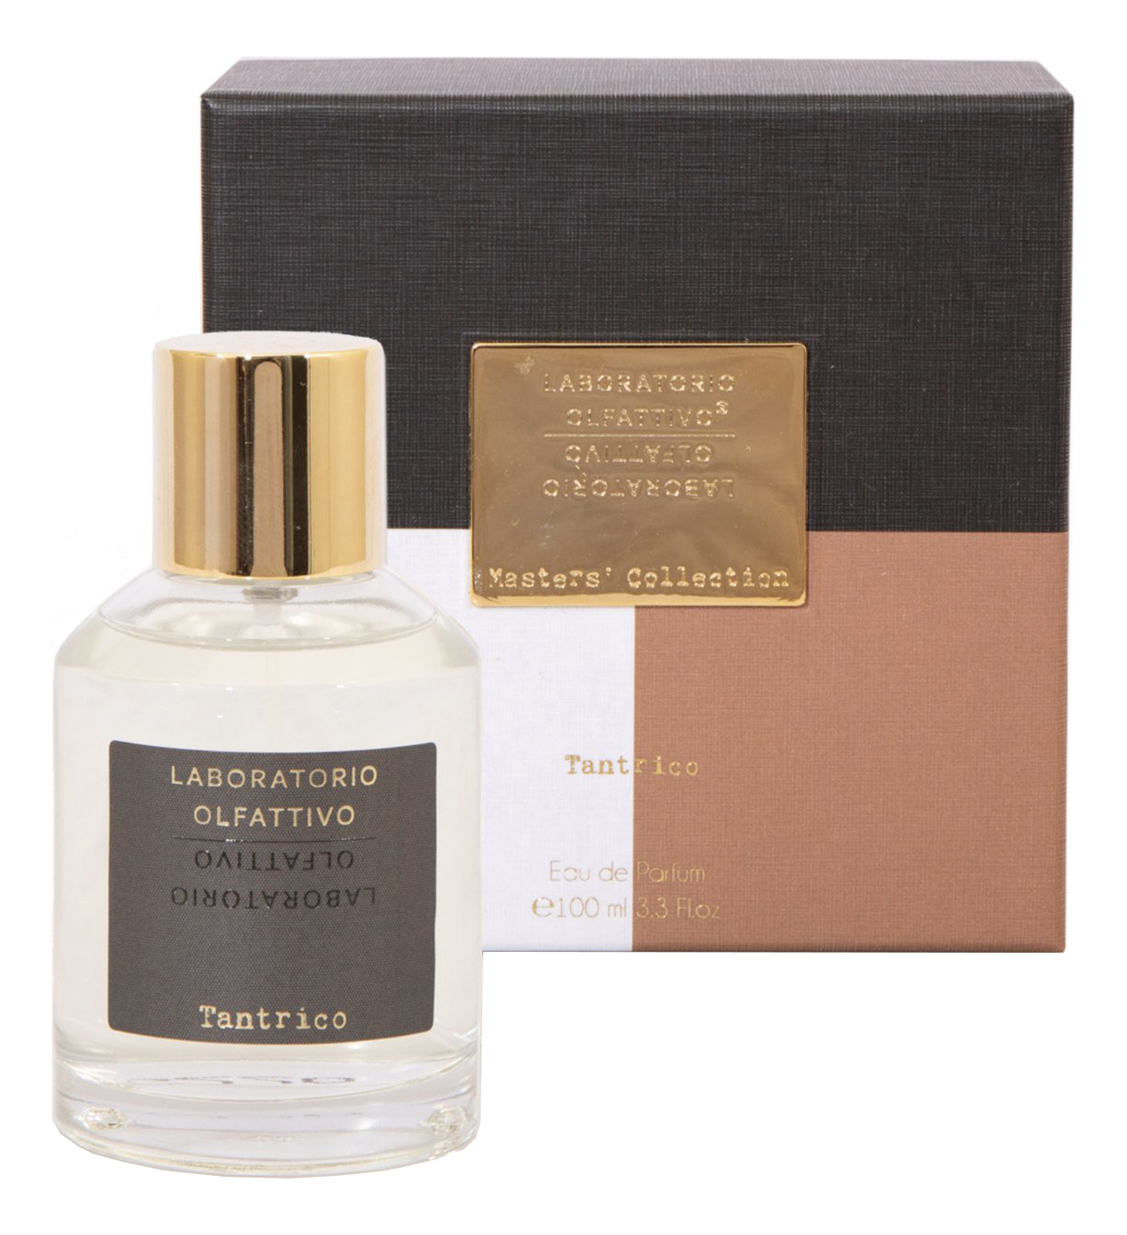 Купить Tantrico: парфюмерная вода 100мл, Laboratorio Olfattivo